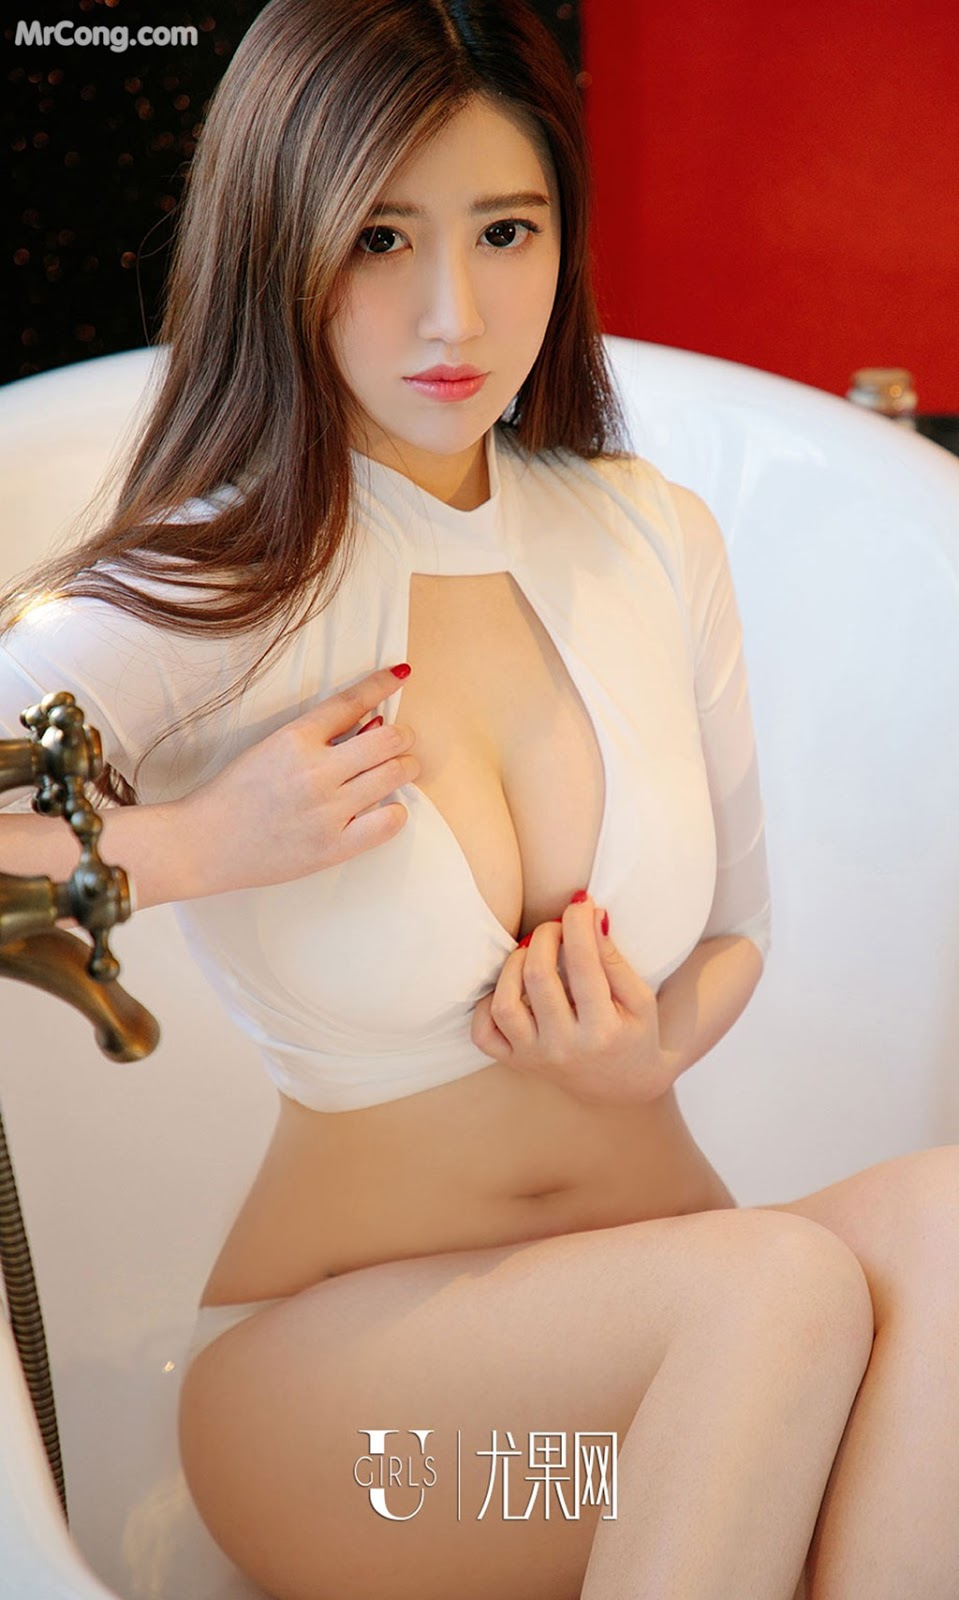 Image UGIRLS-Ai-You-Wu-App-No.964-Ai-Miao-MrCong.com-003 in post UGIRLS – Ai You Wu App No.964: Người mẫu Ai Miao (艾淼) (40 ảnh)